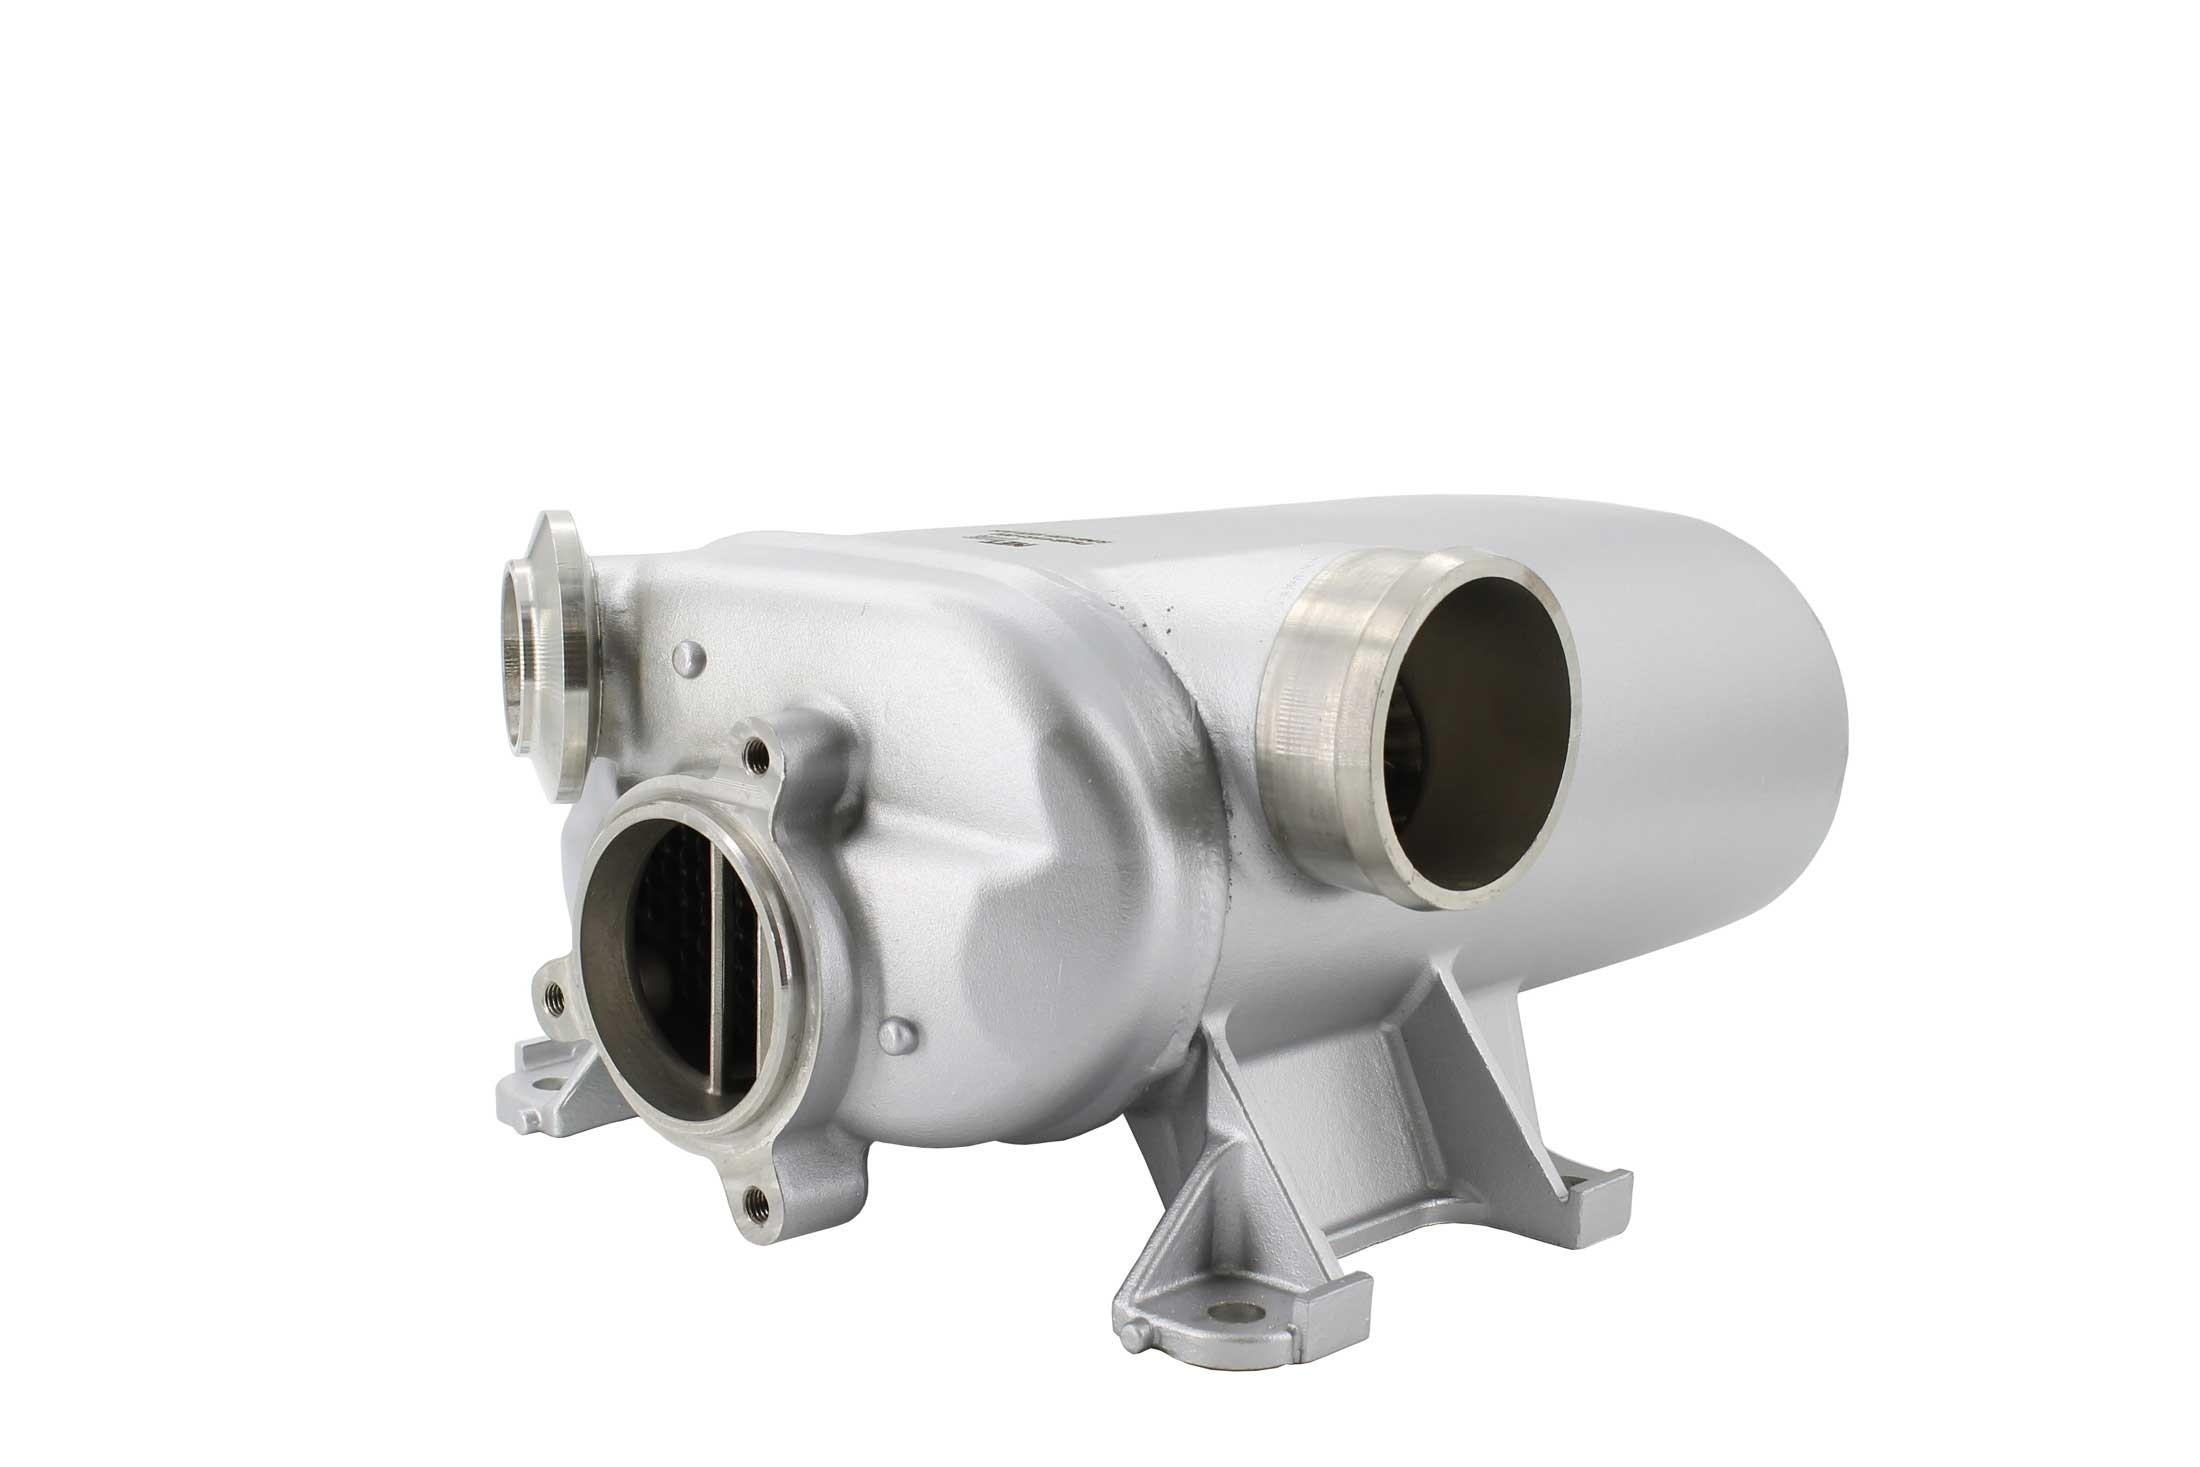 Detroit Diesel 60 Series EGR Cooler.